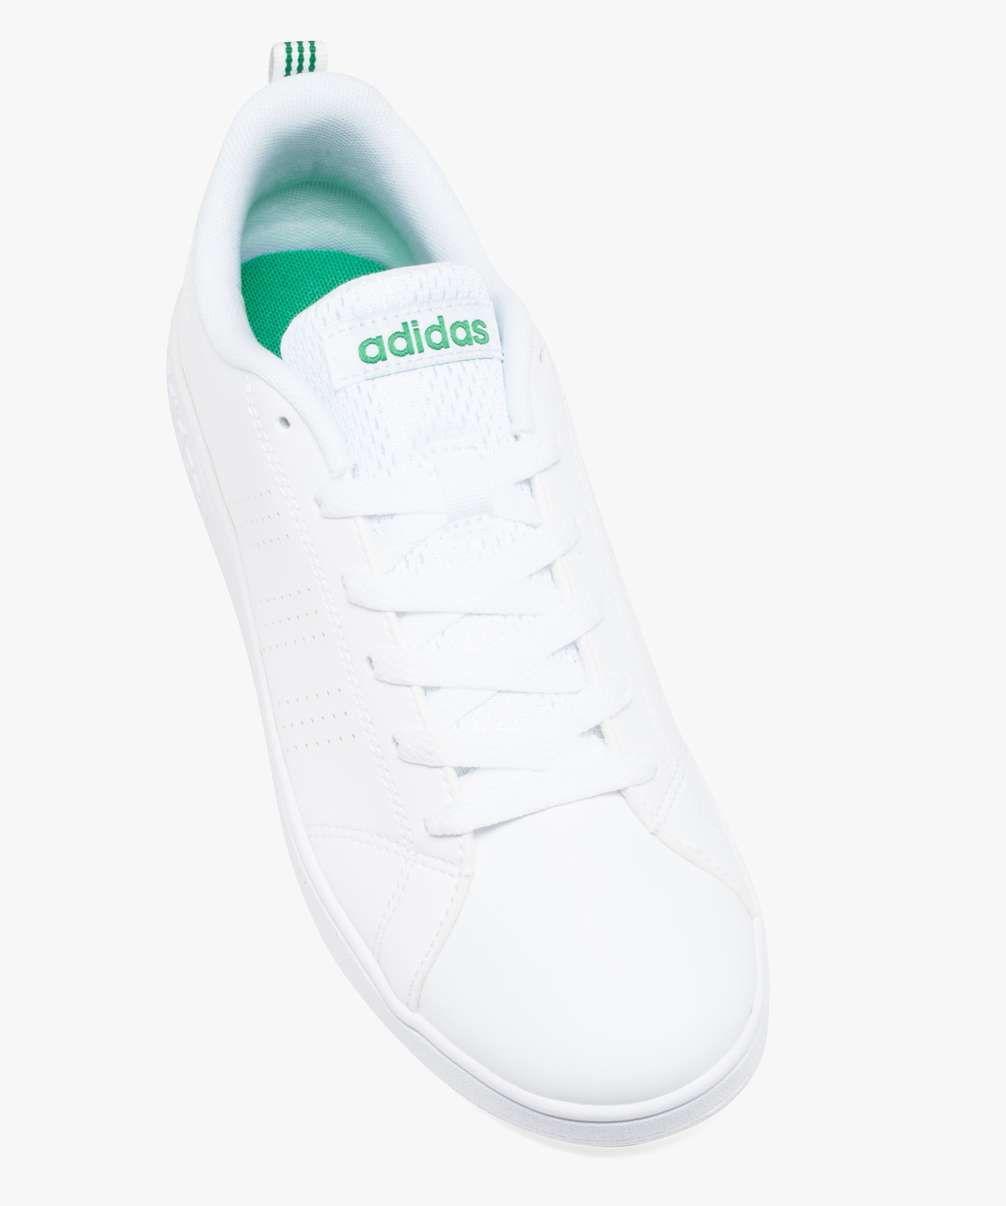 adidas neo blanche gemo